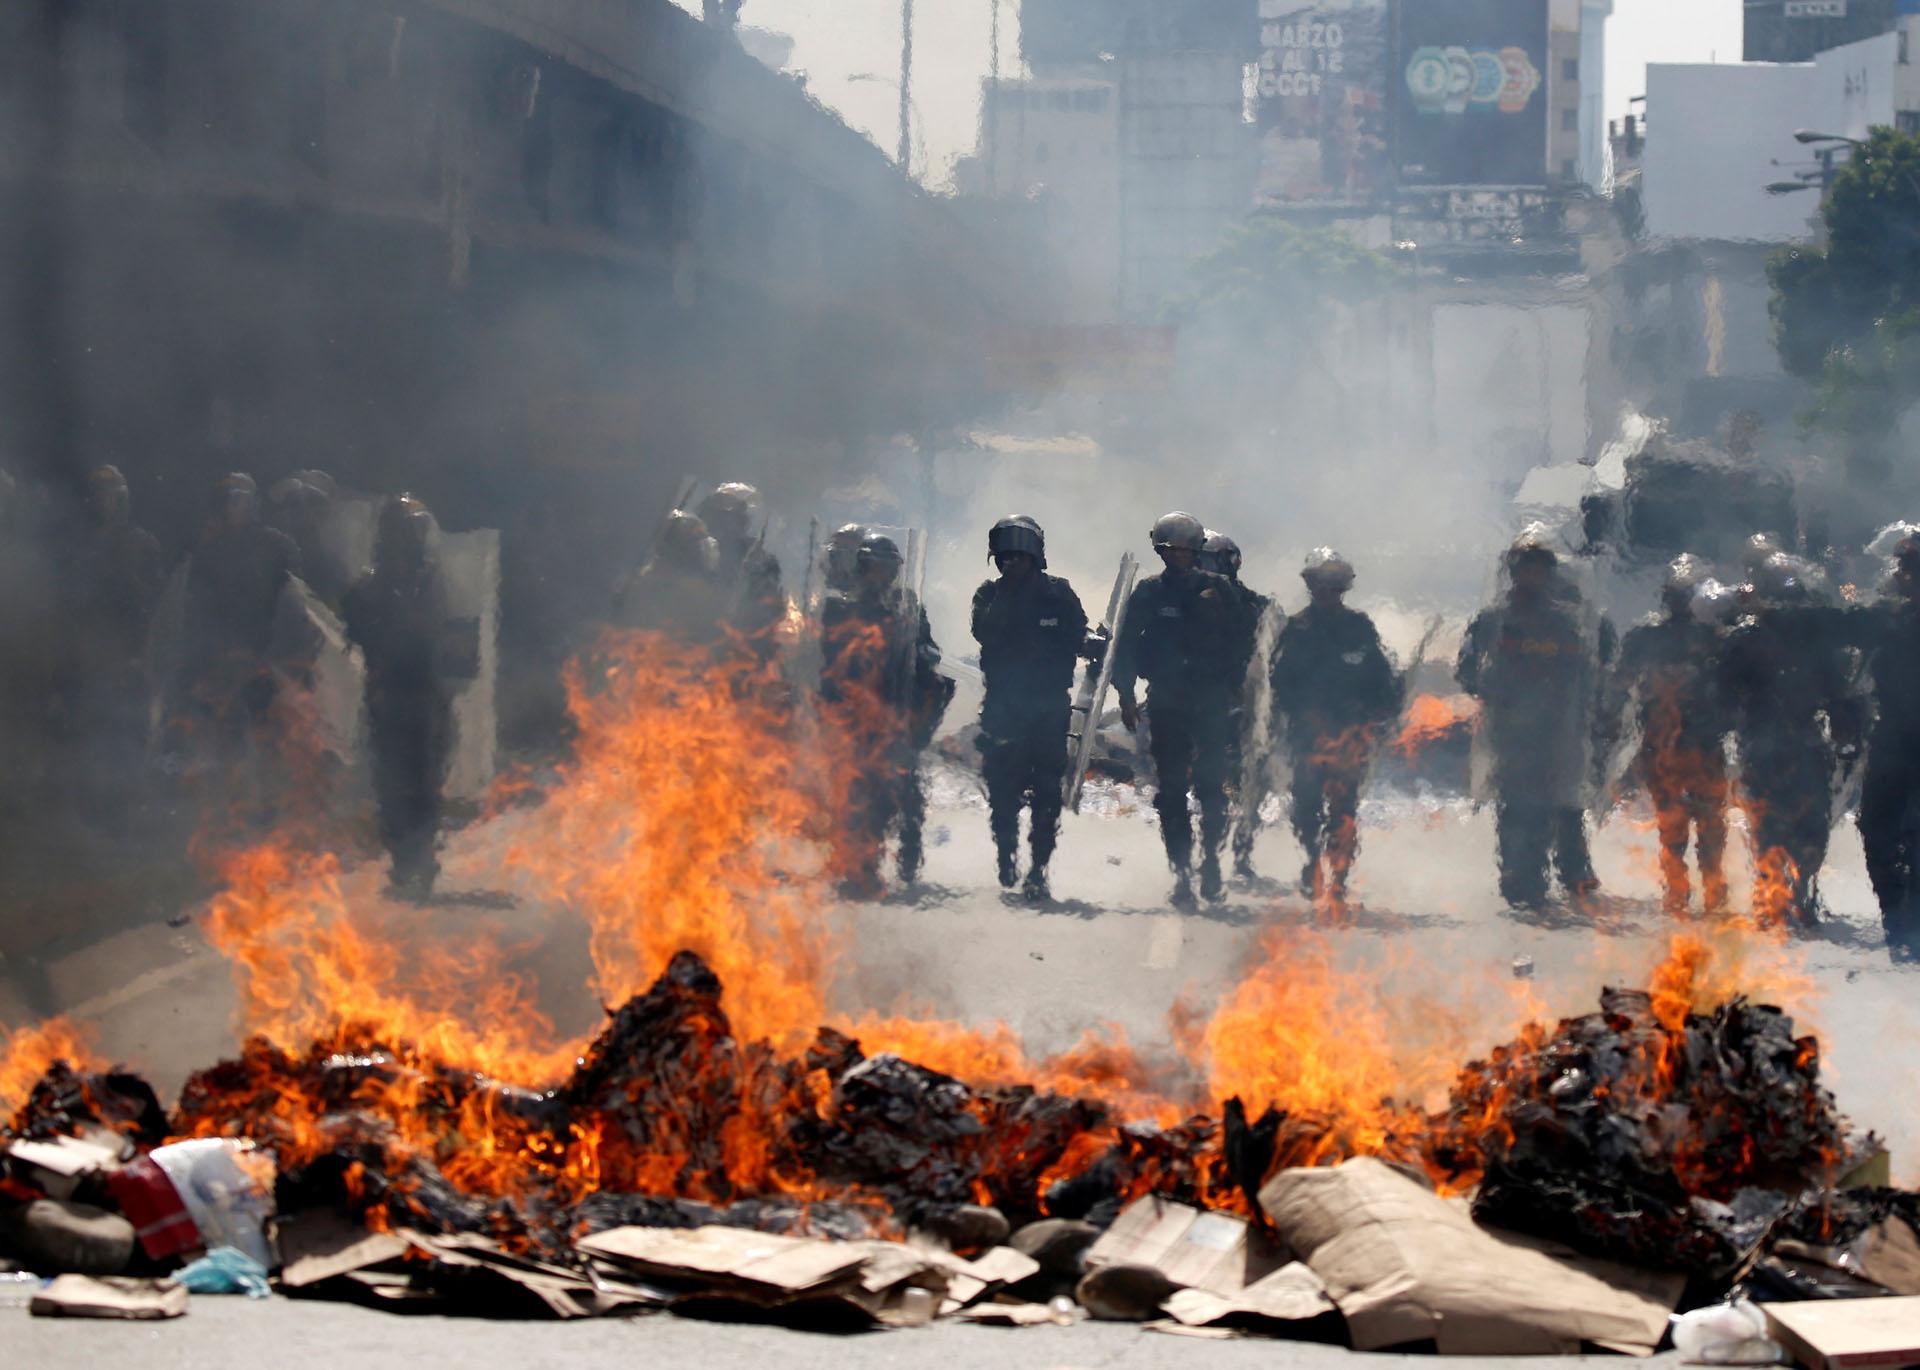 Venezuelan national guards are seen through a burning barricade during an opposition rally in Caracas, Venezuela, April 6, 2017. REUTERS/Carlos Garcia Rawlins